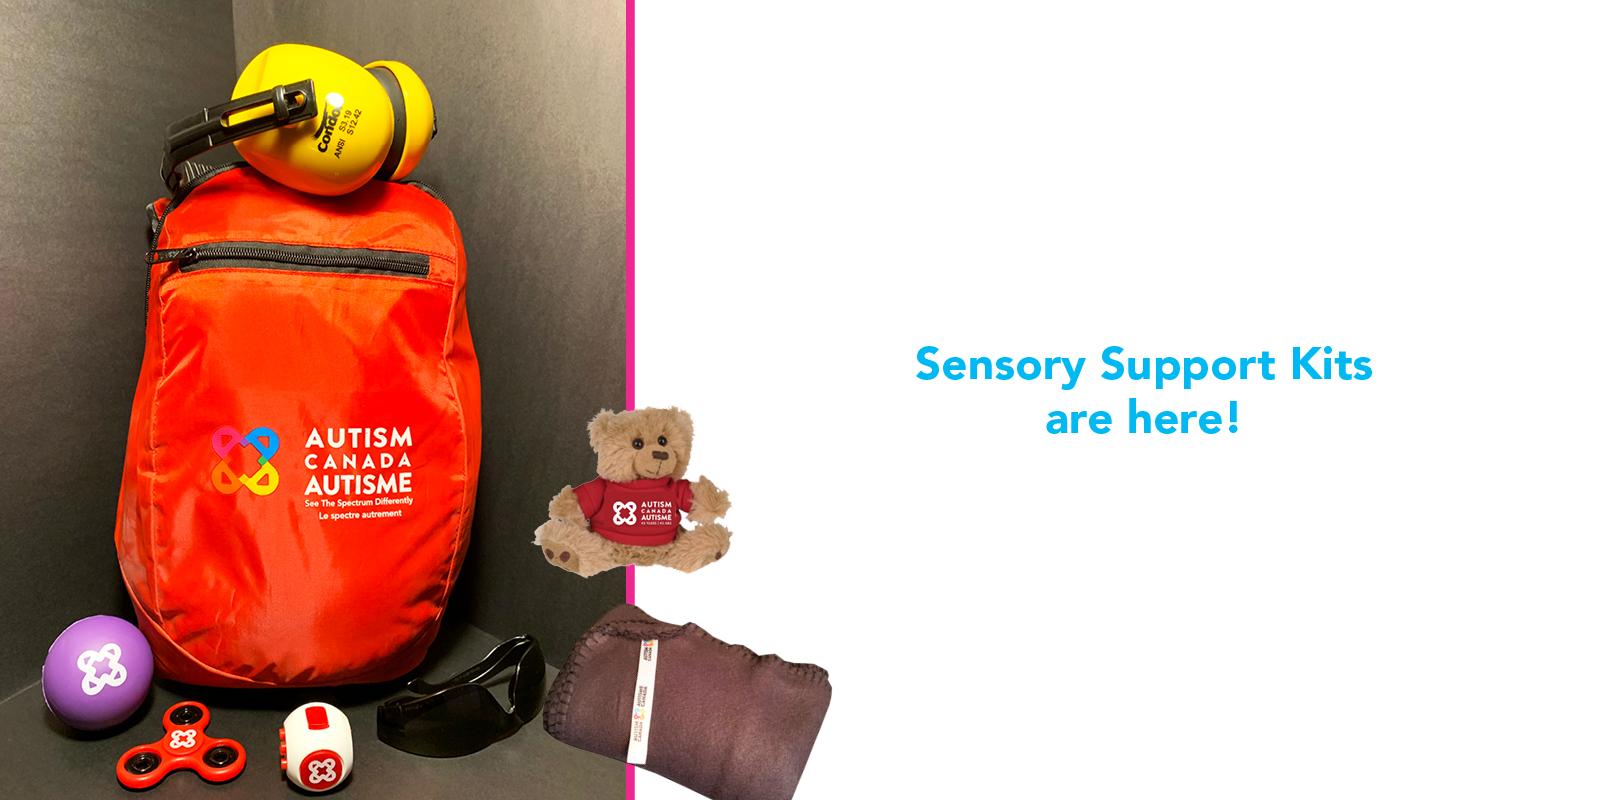 Sensory Support Kits